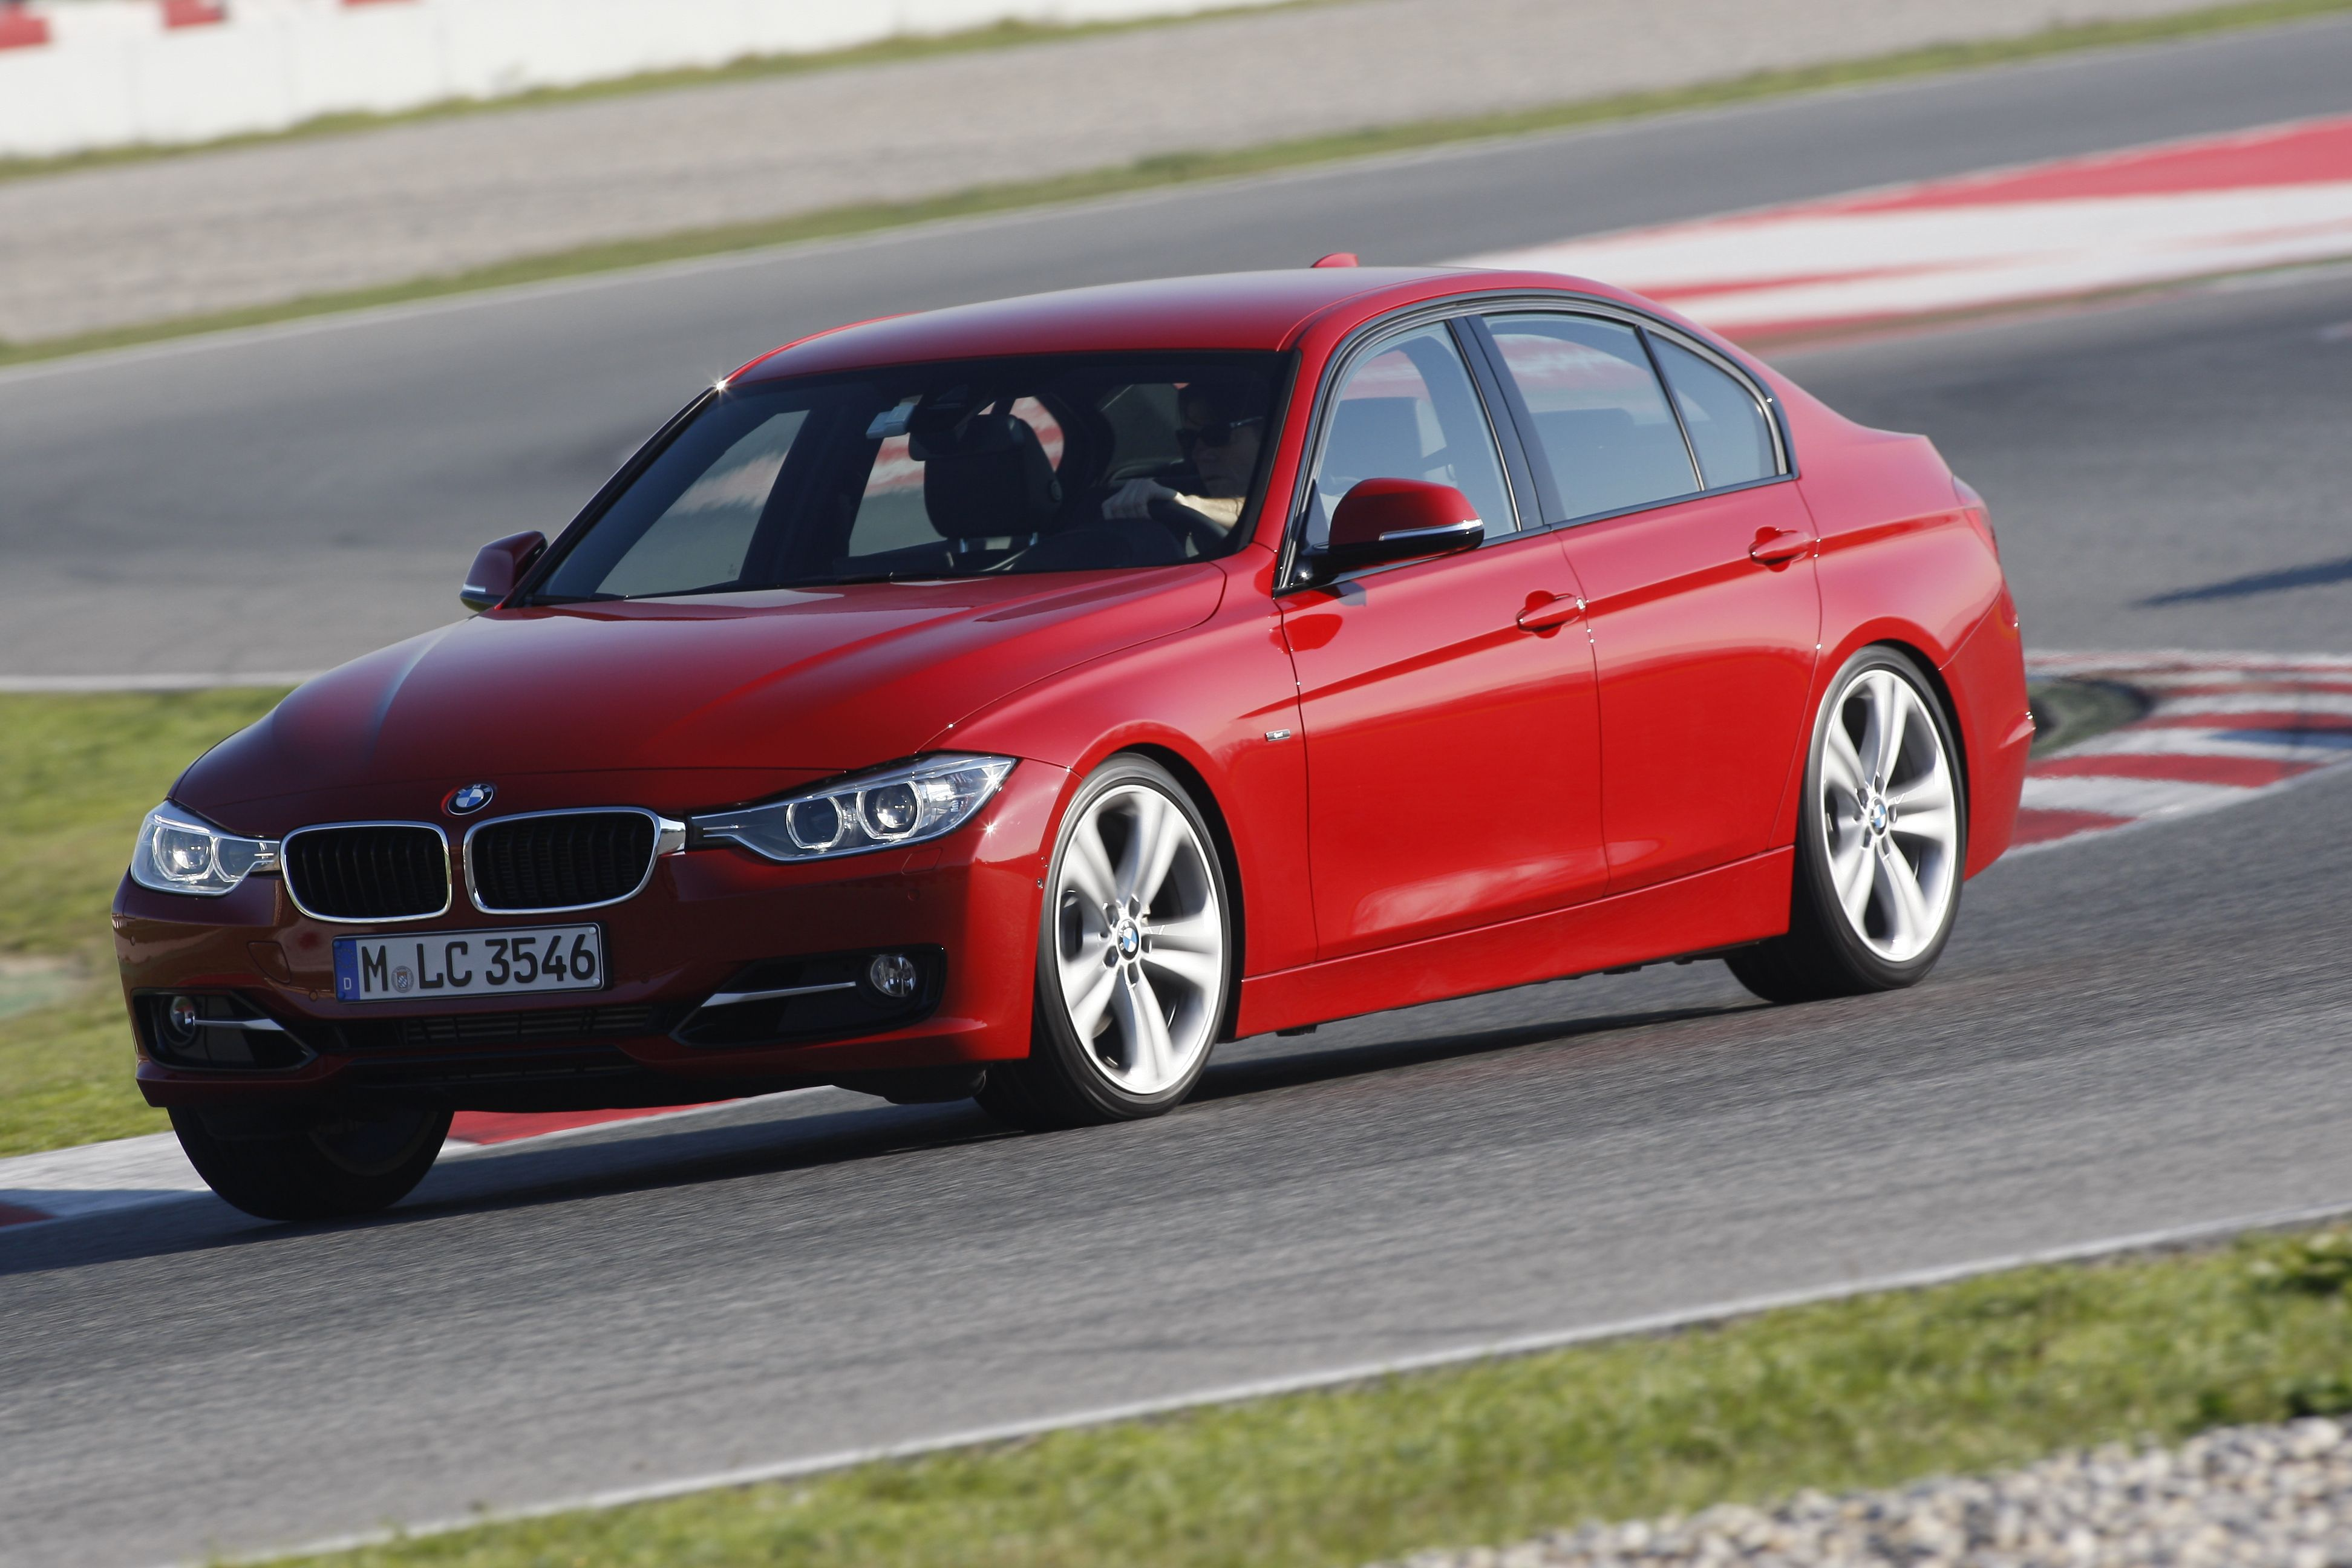 2012 bmw 3 series on track  324